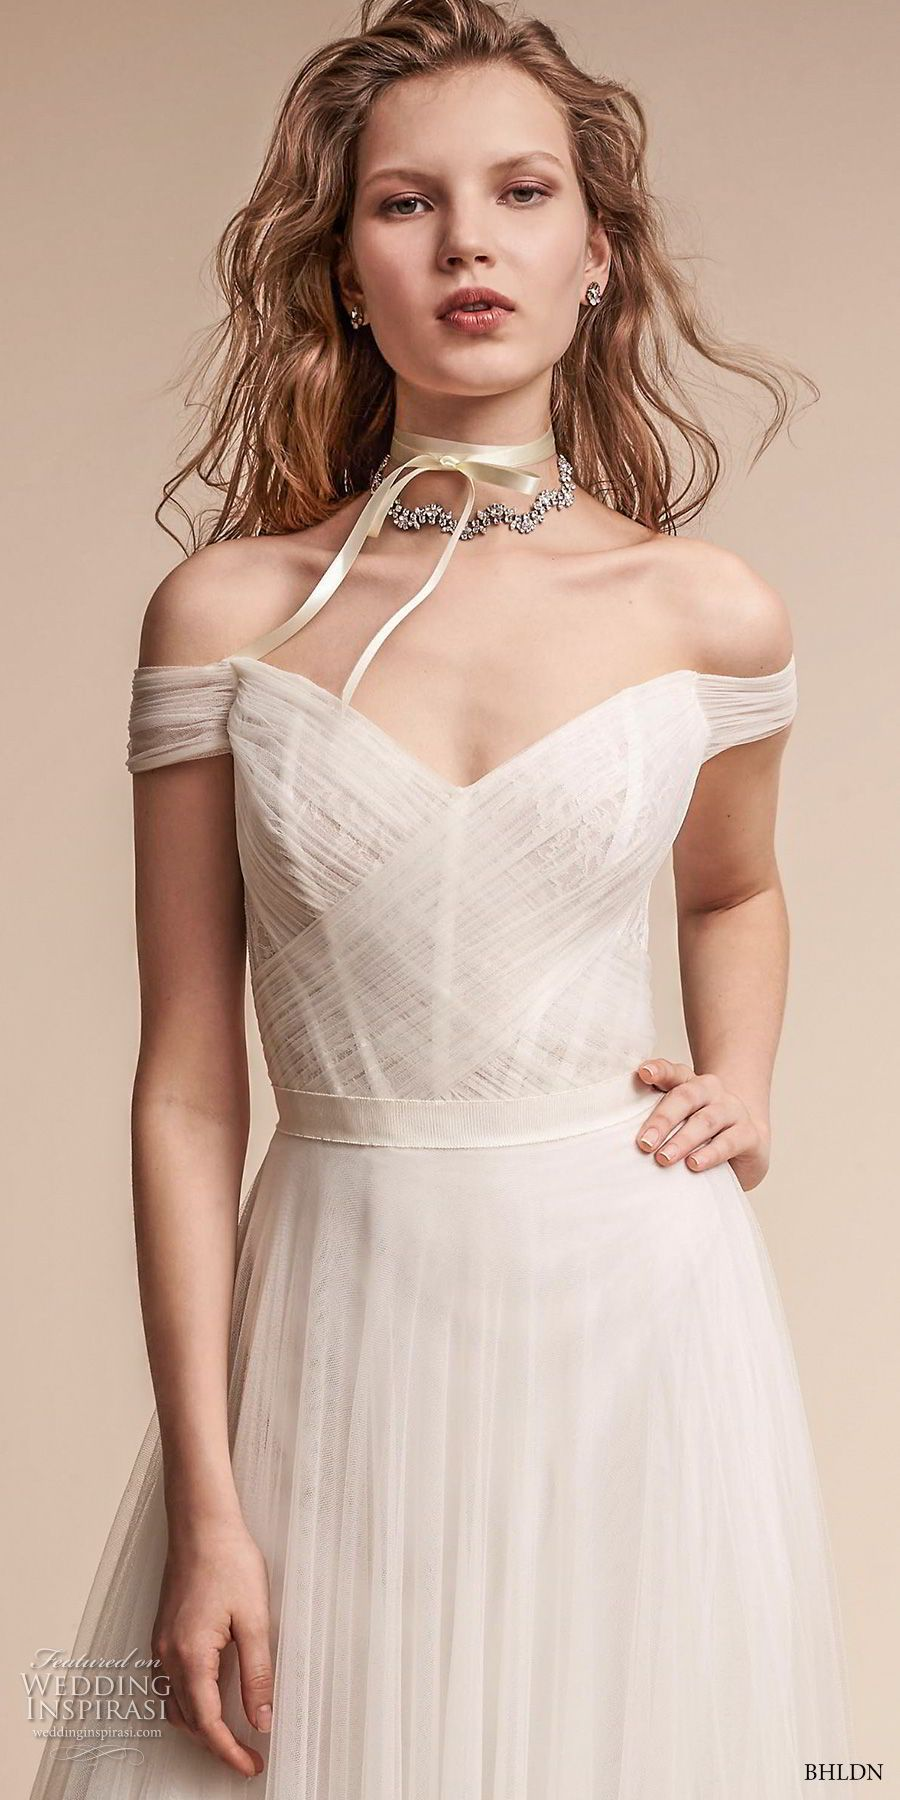 Bhldn freshest fall wedding looks u ucamericanaud bridal campaign